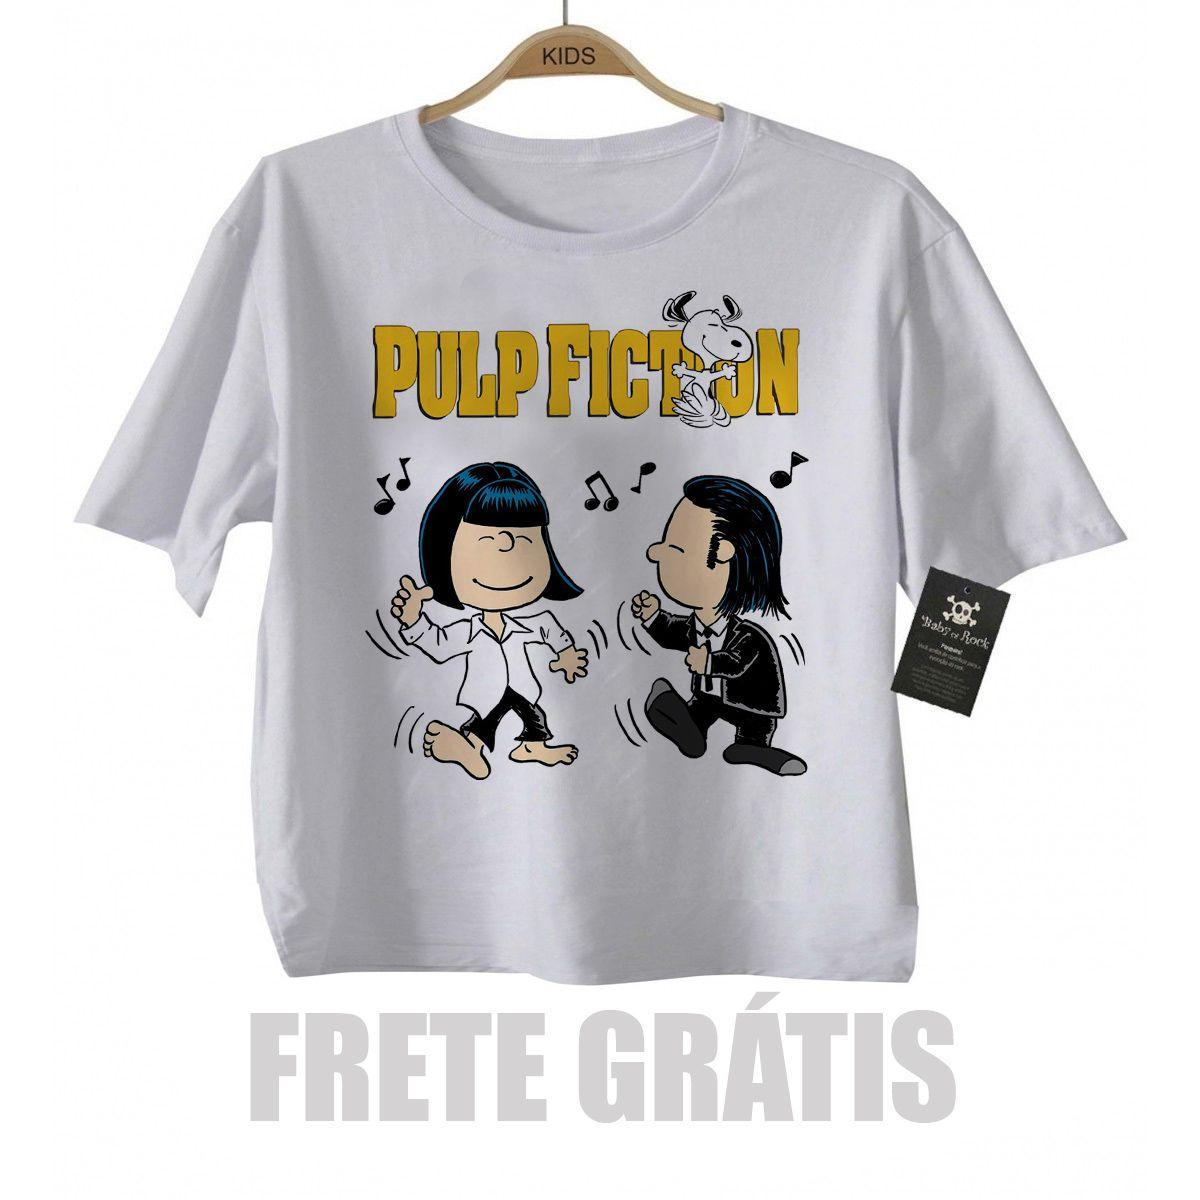 Camiseta infantil filmes Pulp Fiction - Snoopy  (Tarantino) - White  - Baby Monster S/A